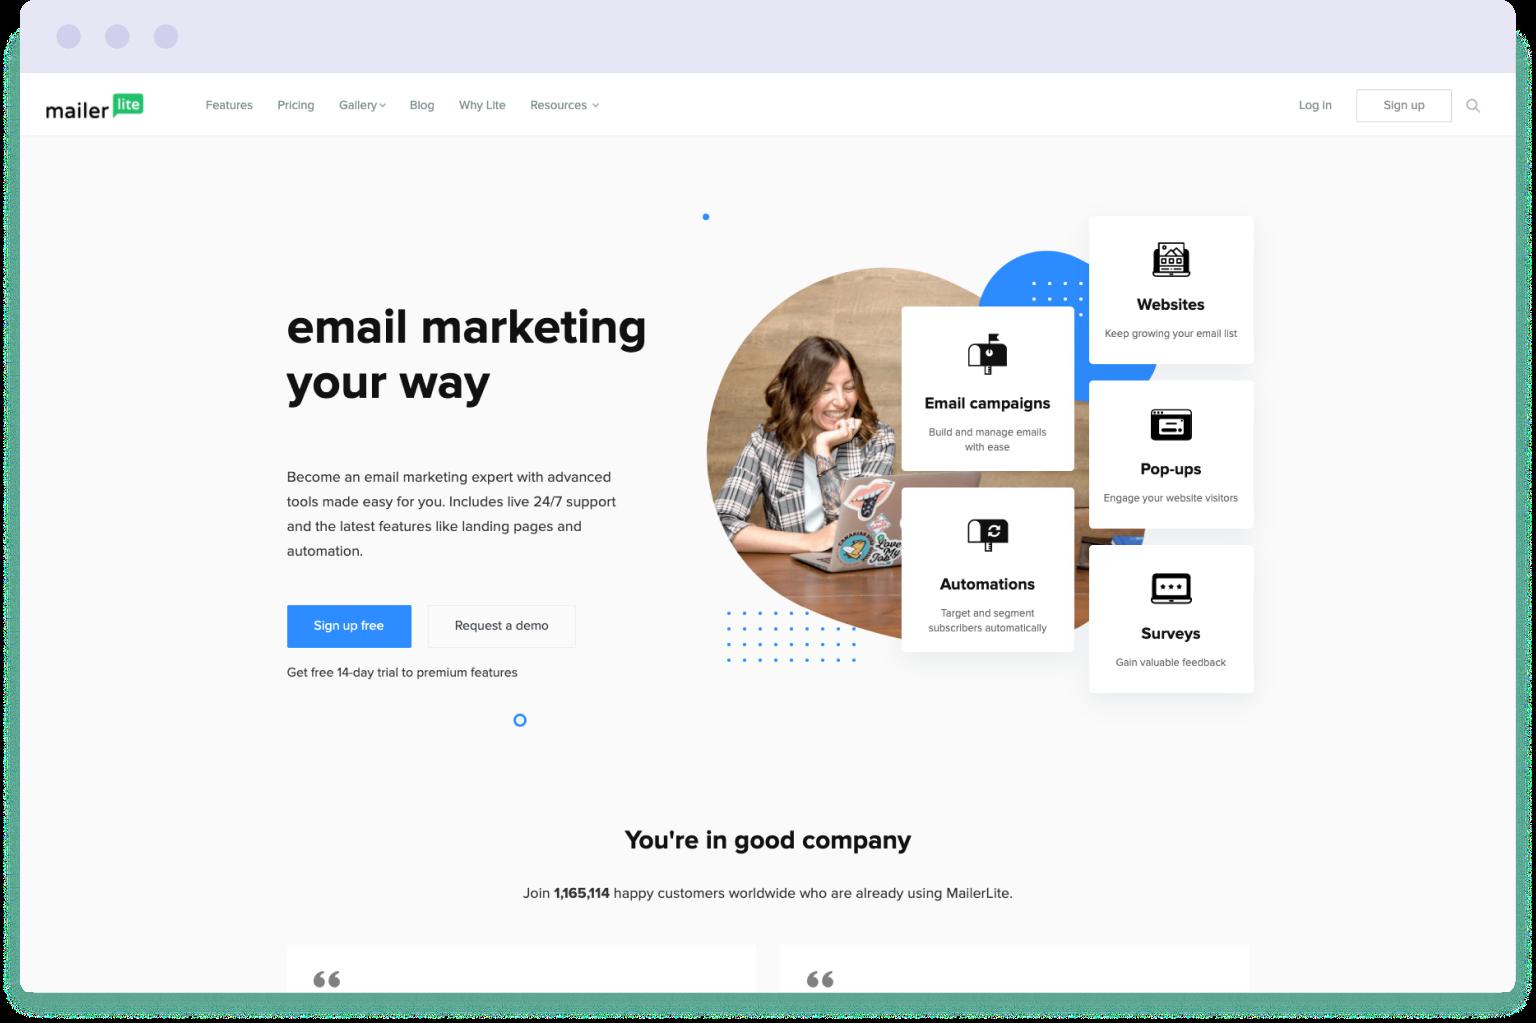 Image of the Mailerlite website homepage. Mailerlite is a cheaper alternative to Mailchimp.